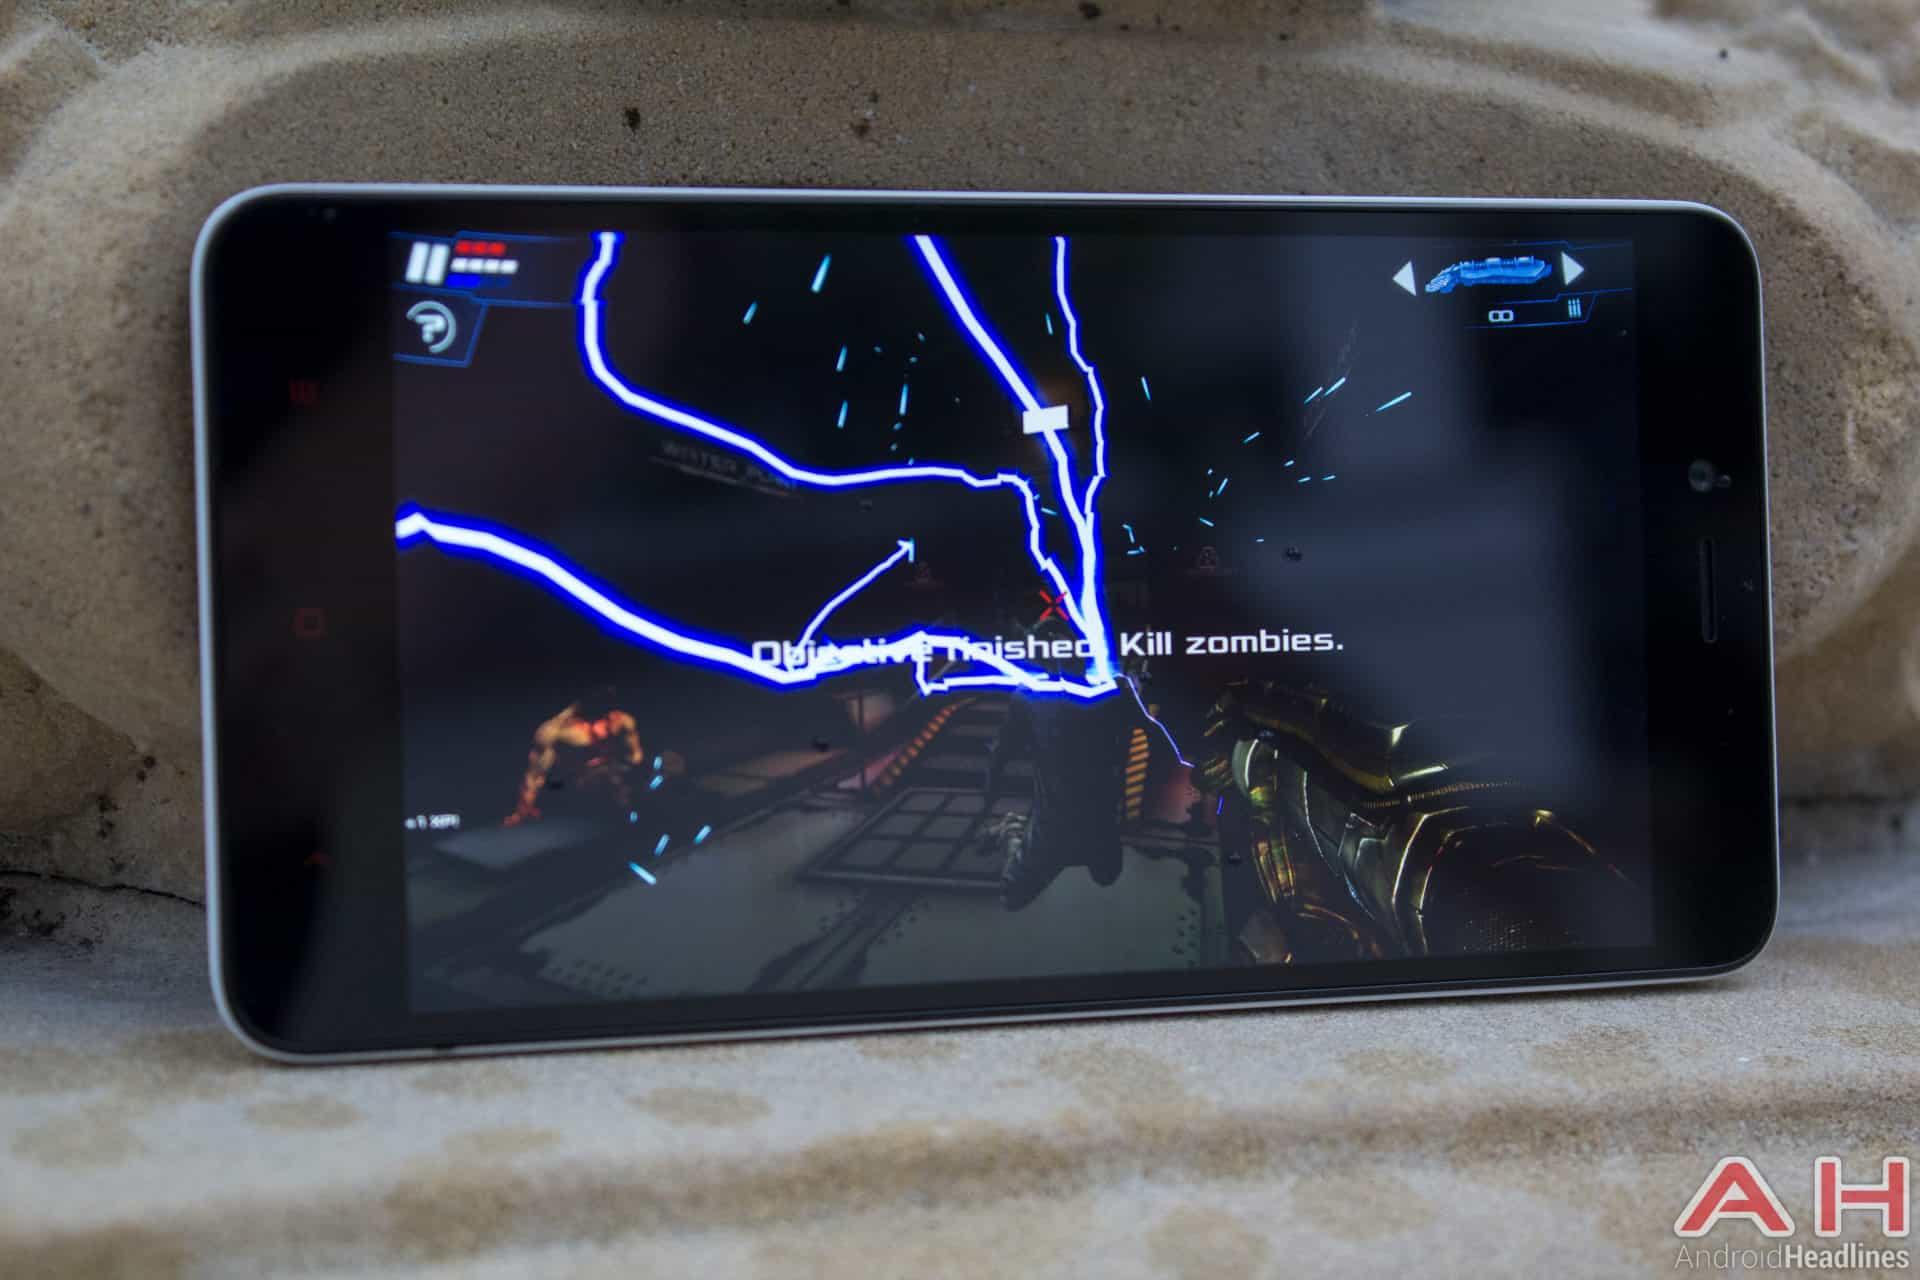 Xiaomi-Redmi-Note-2-AH-performance